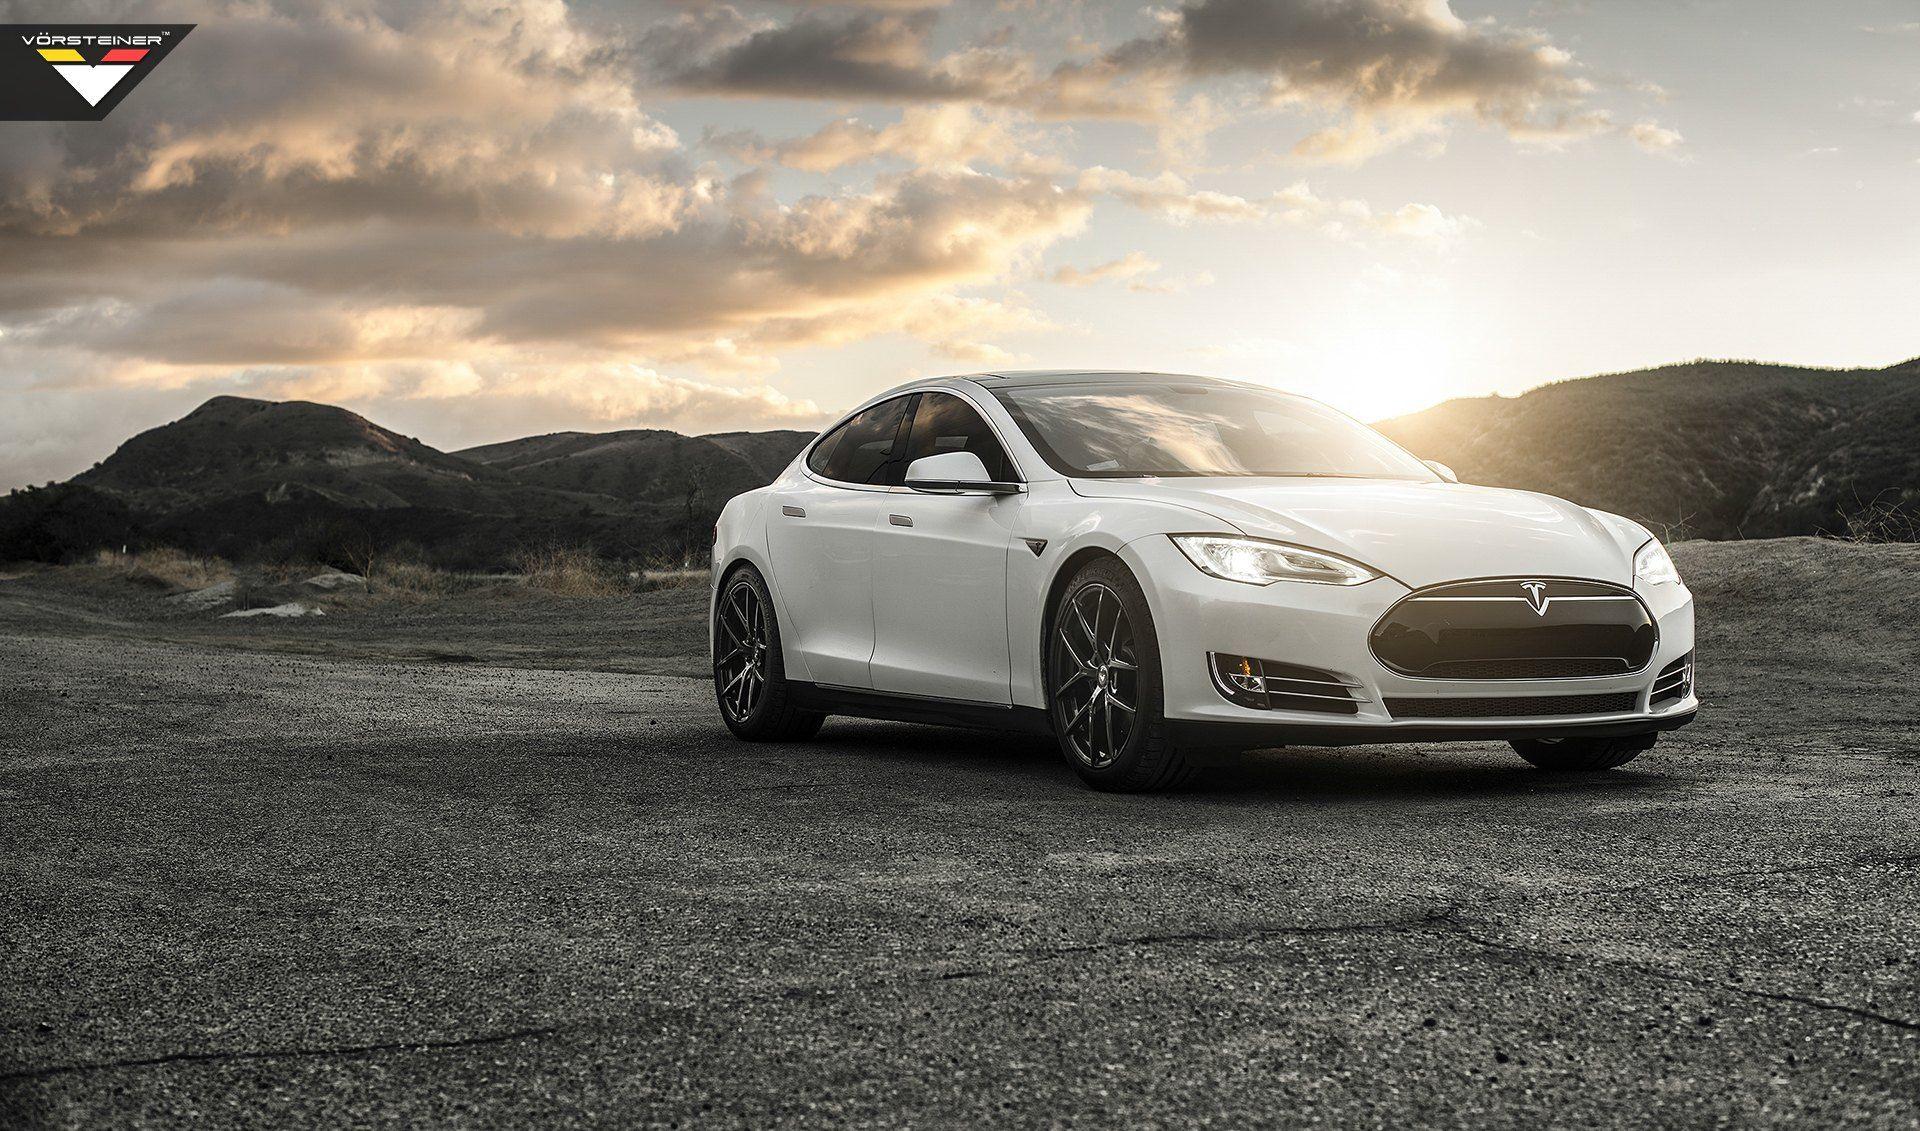 Beautiful Angel White Tesla Model S with New Eyes Tesla